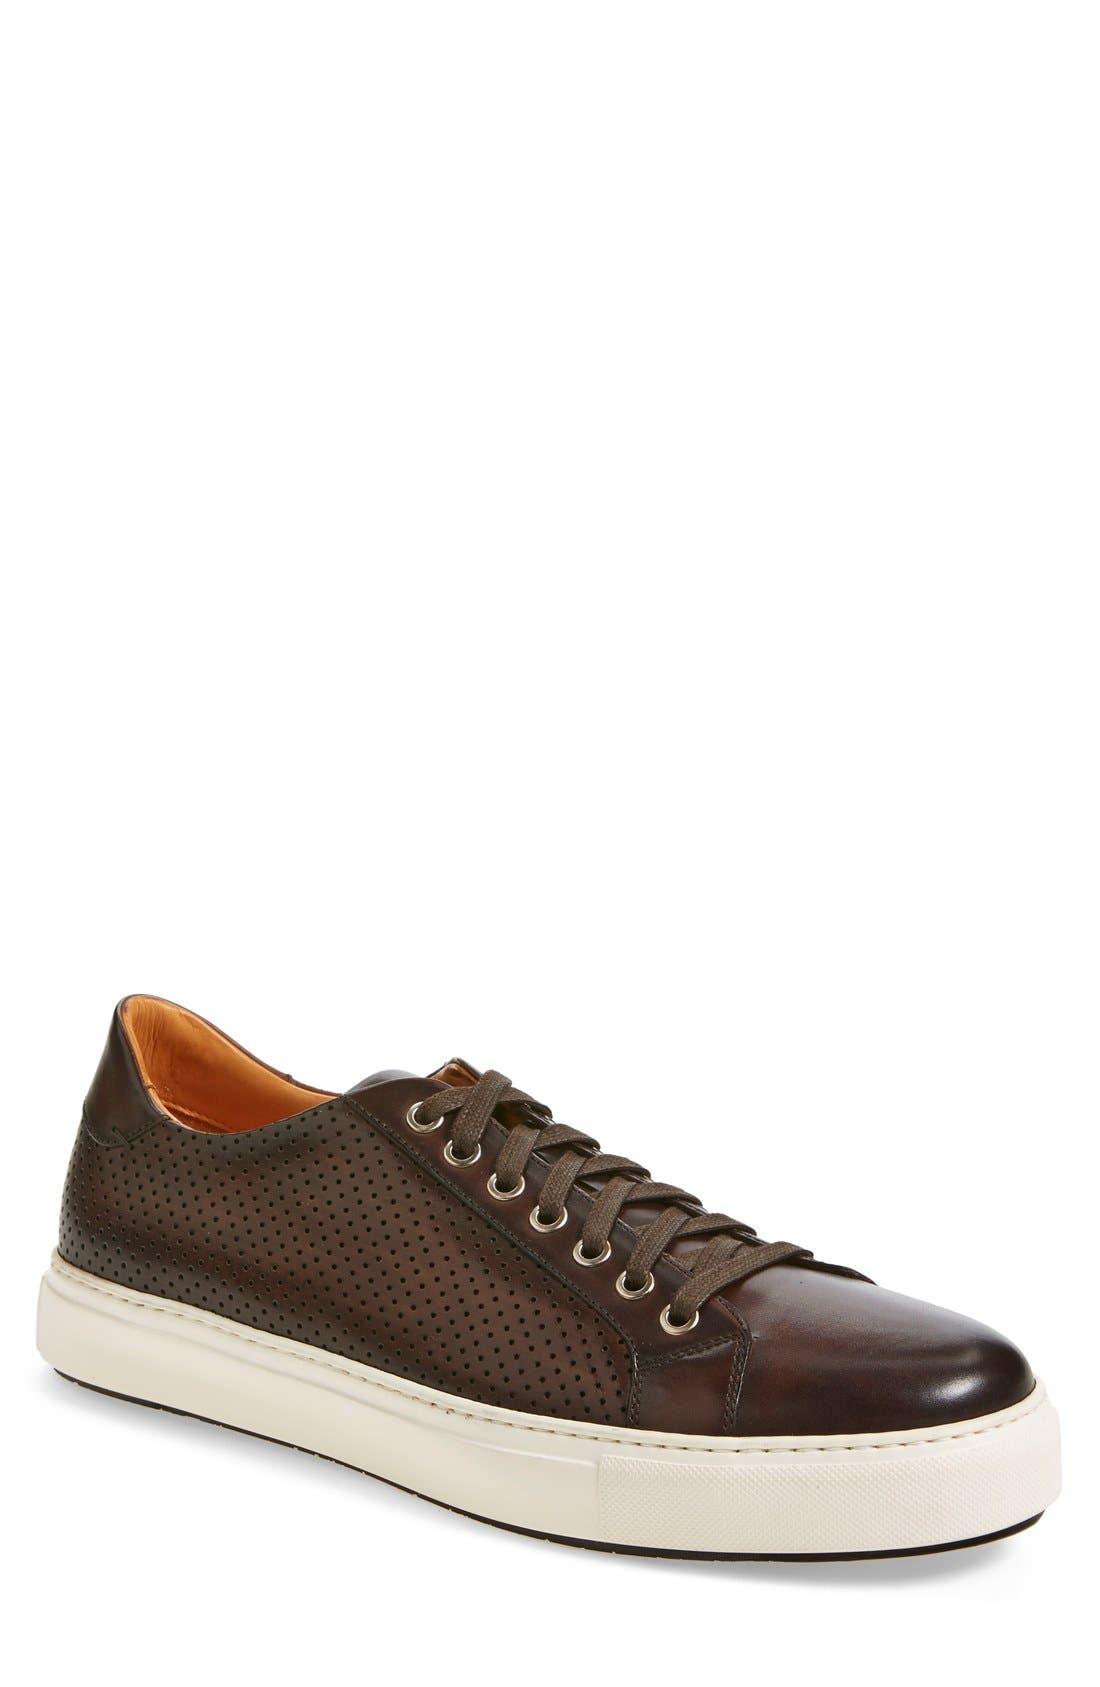 'Blanco' Sneaker,                         Main,                         color, 210